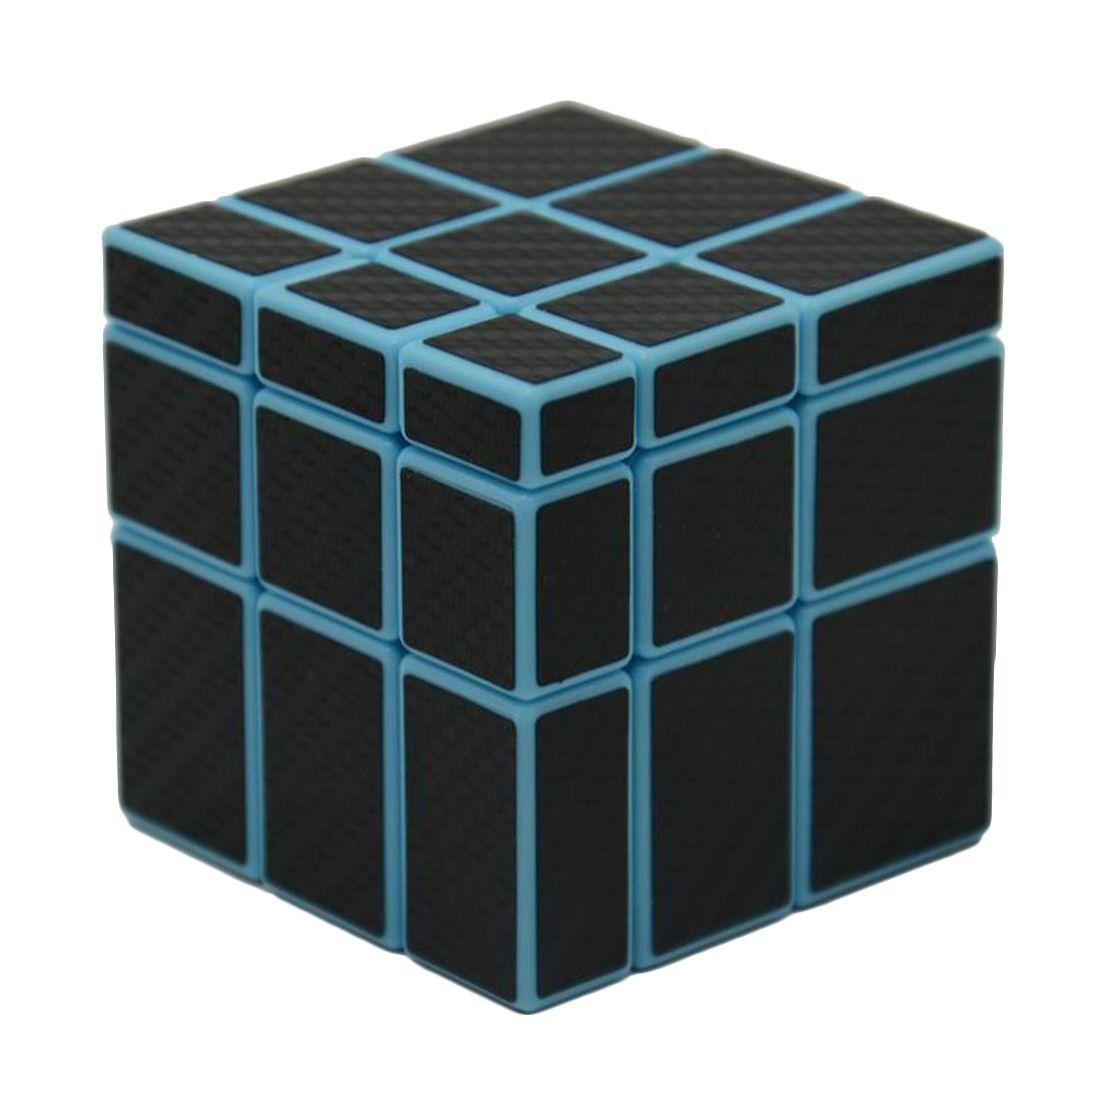 3x3x3 Mirror Blocks Carbon Fiber Sticker Magic Cube Puzzle Speed Cube 57mm